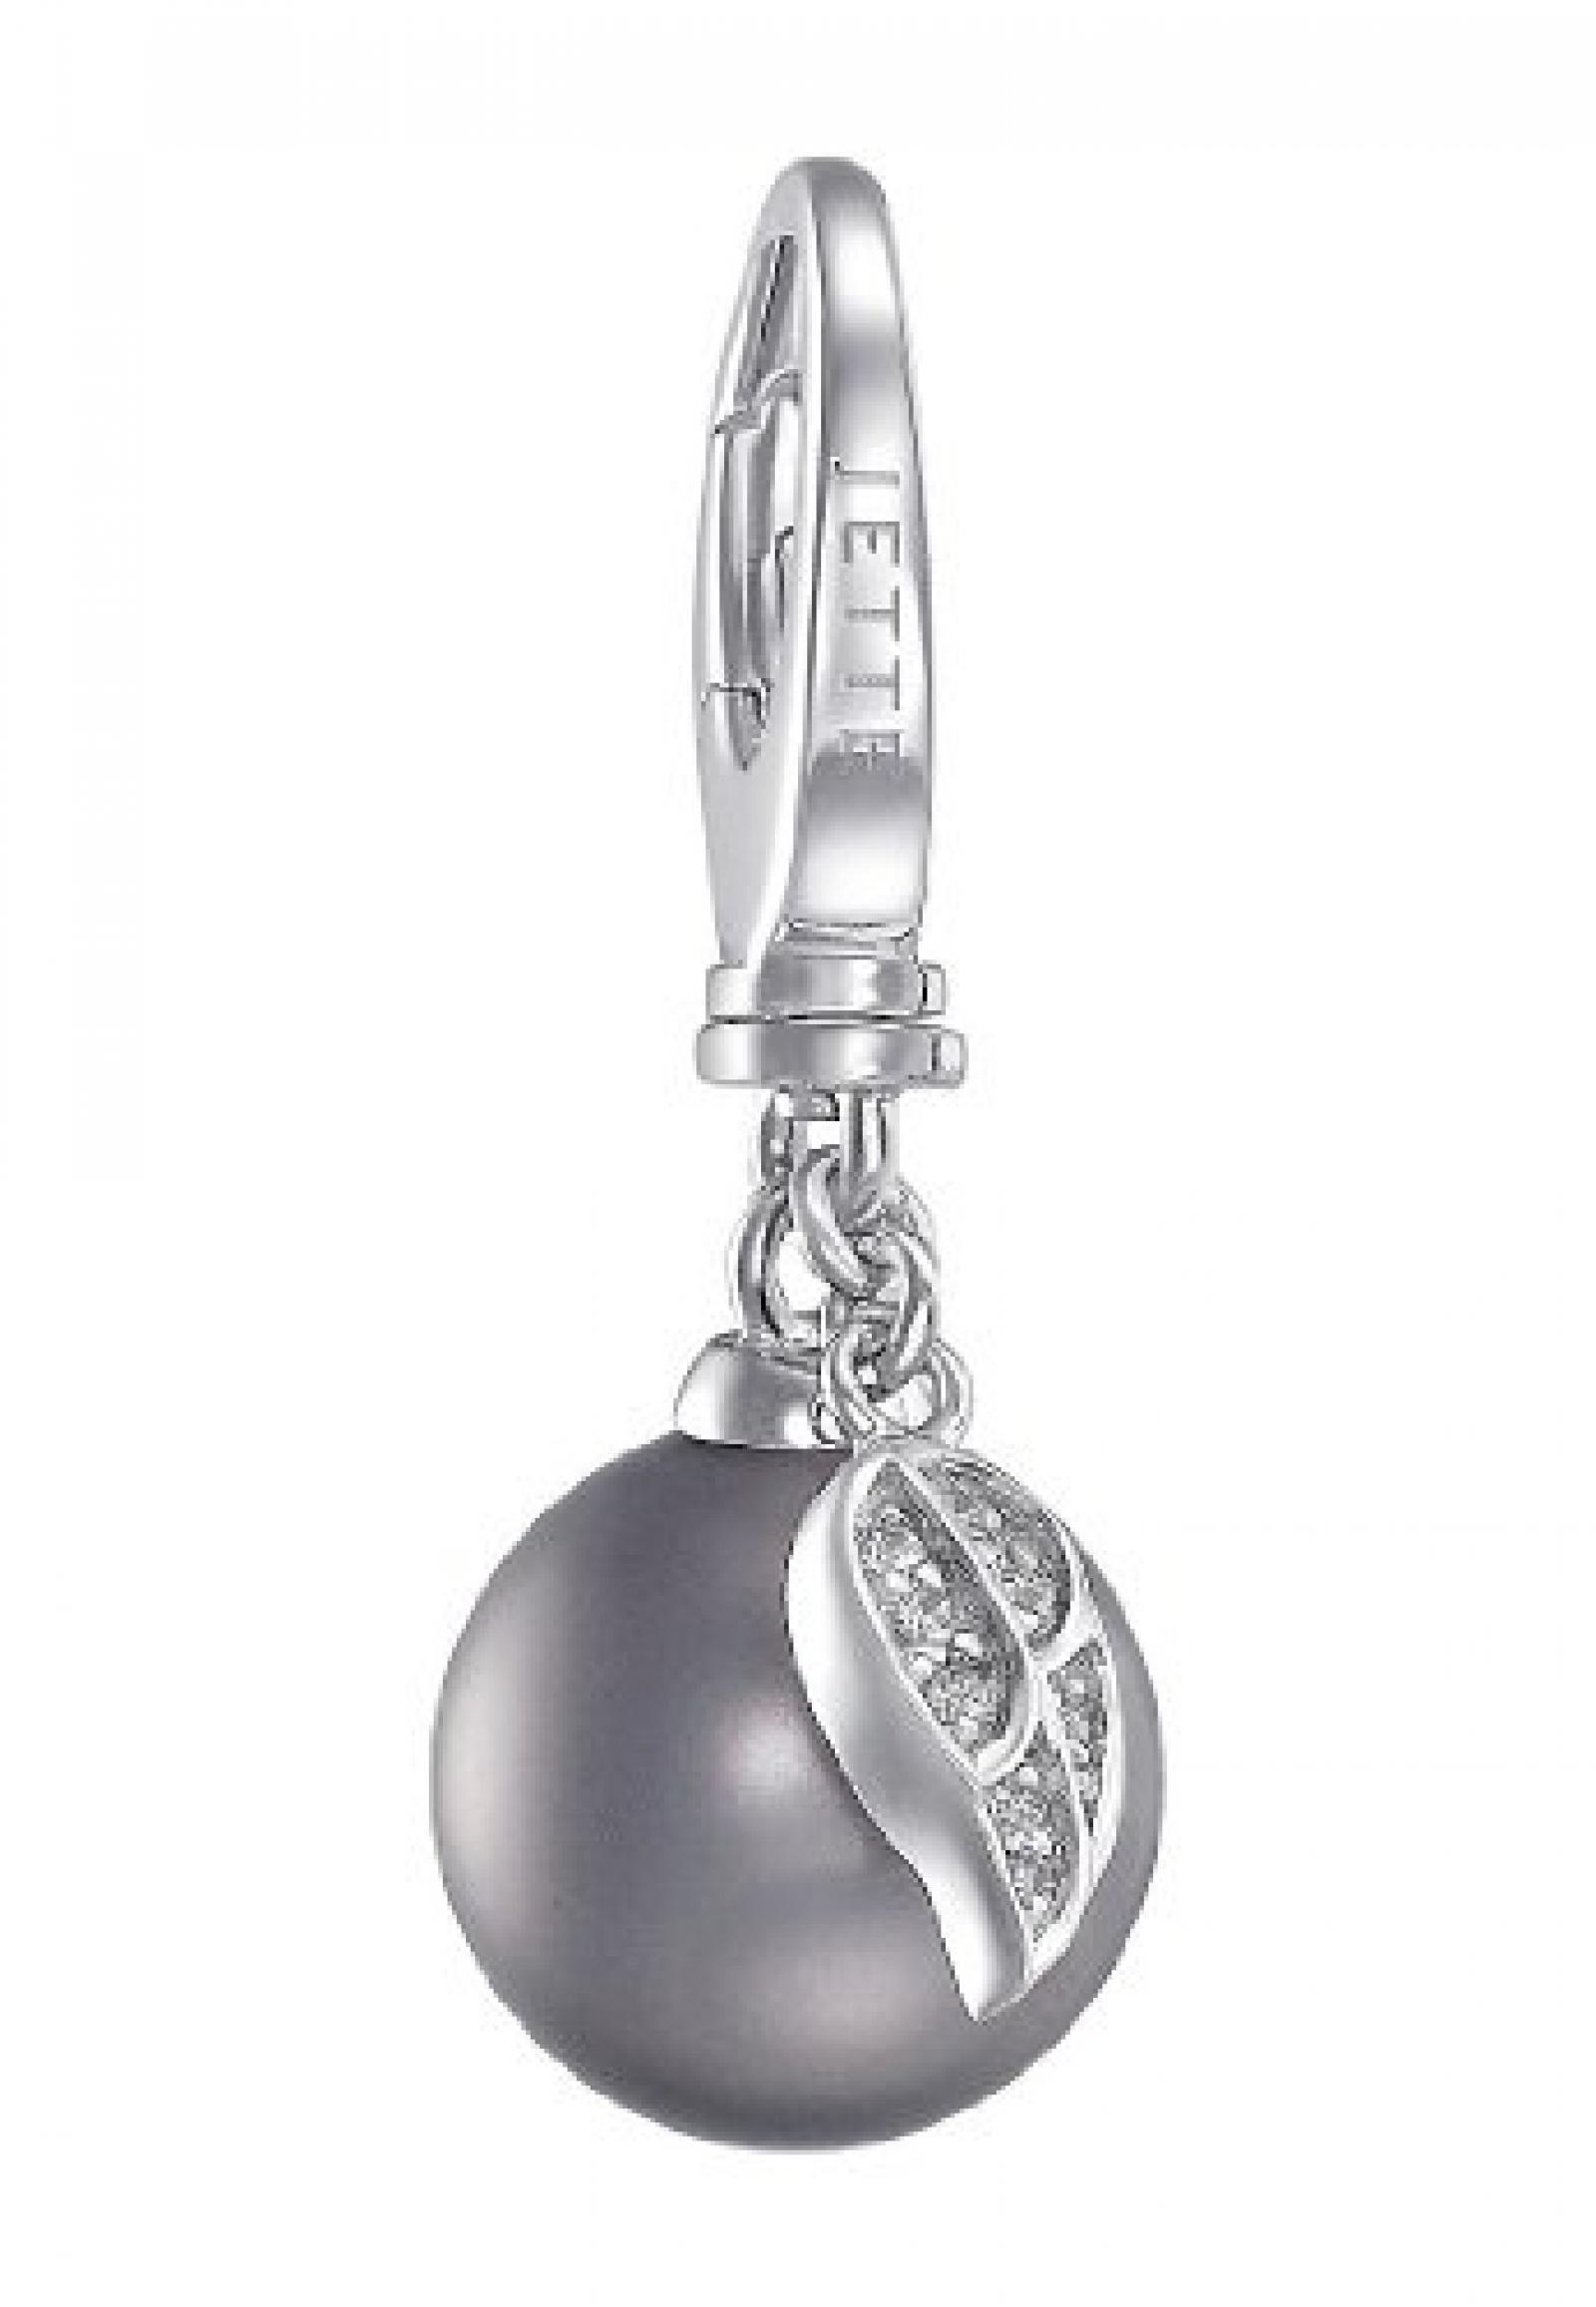 JETTE Charms Damen-Charm Perle Mit Flügel 925er Silber 1 Muschelkernperle 8 Zirkonia One Size, silber